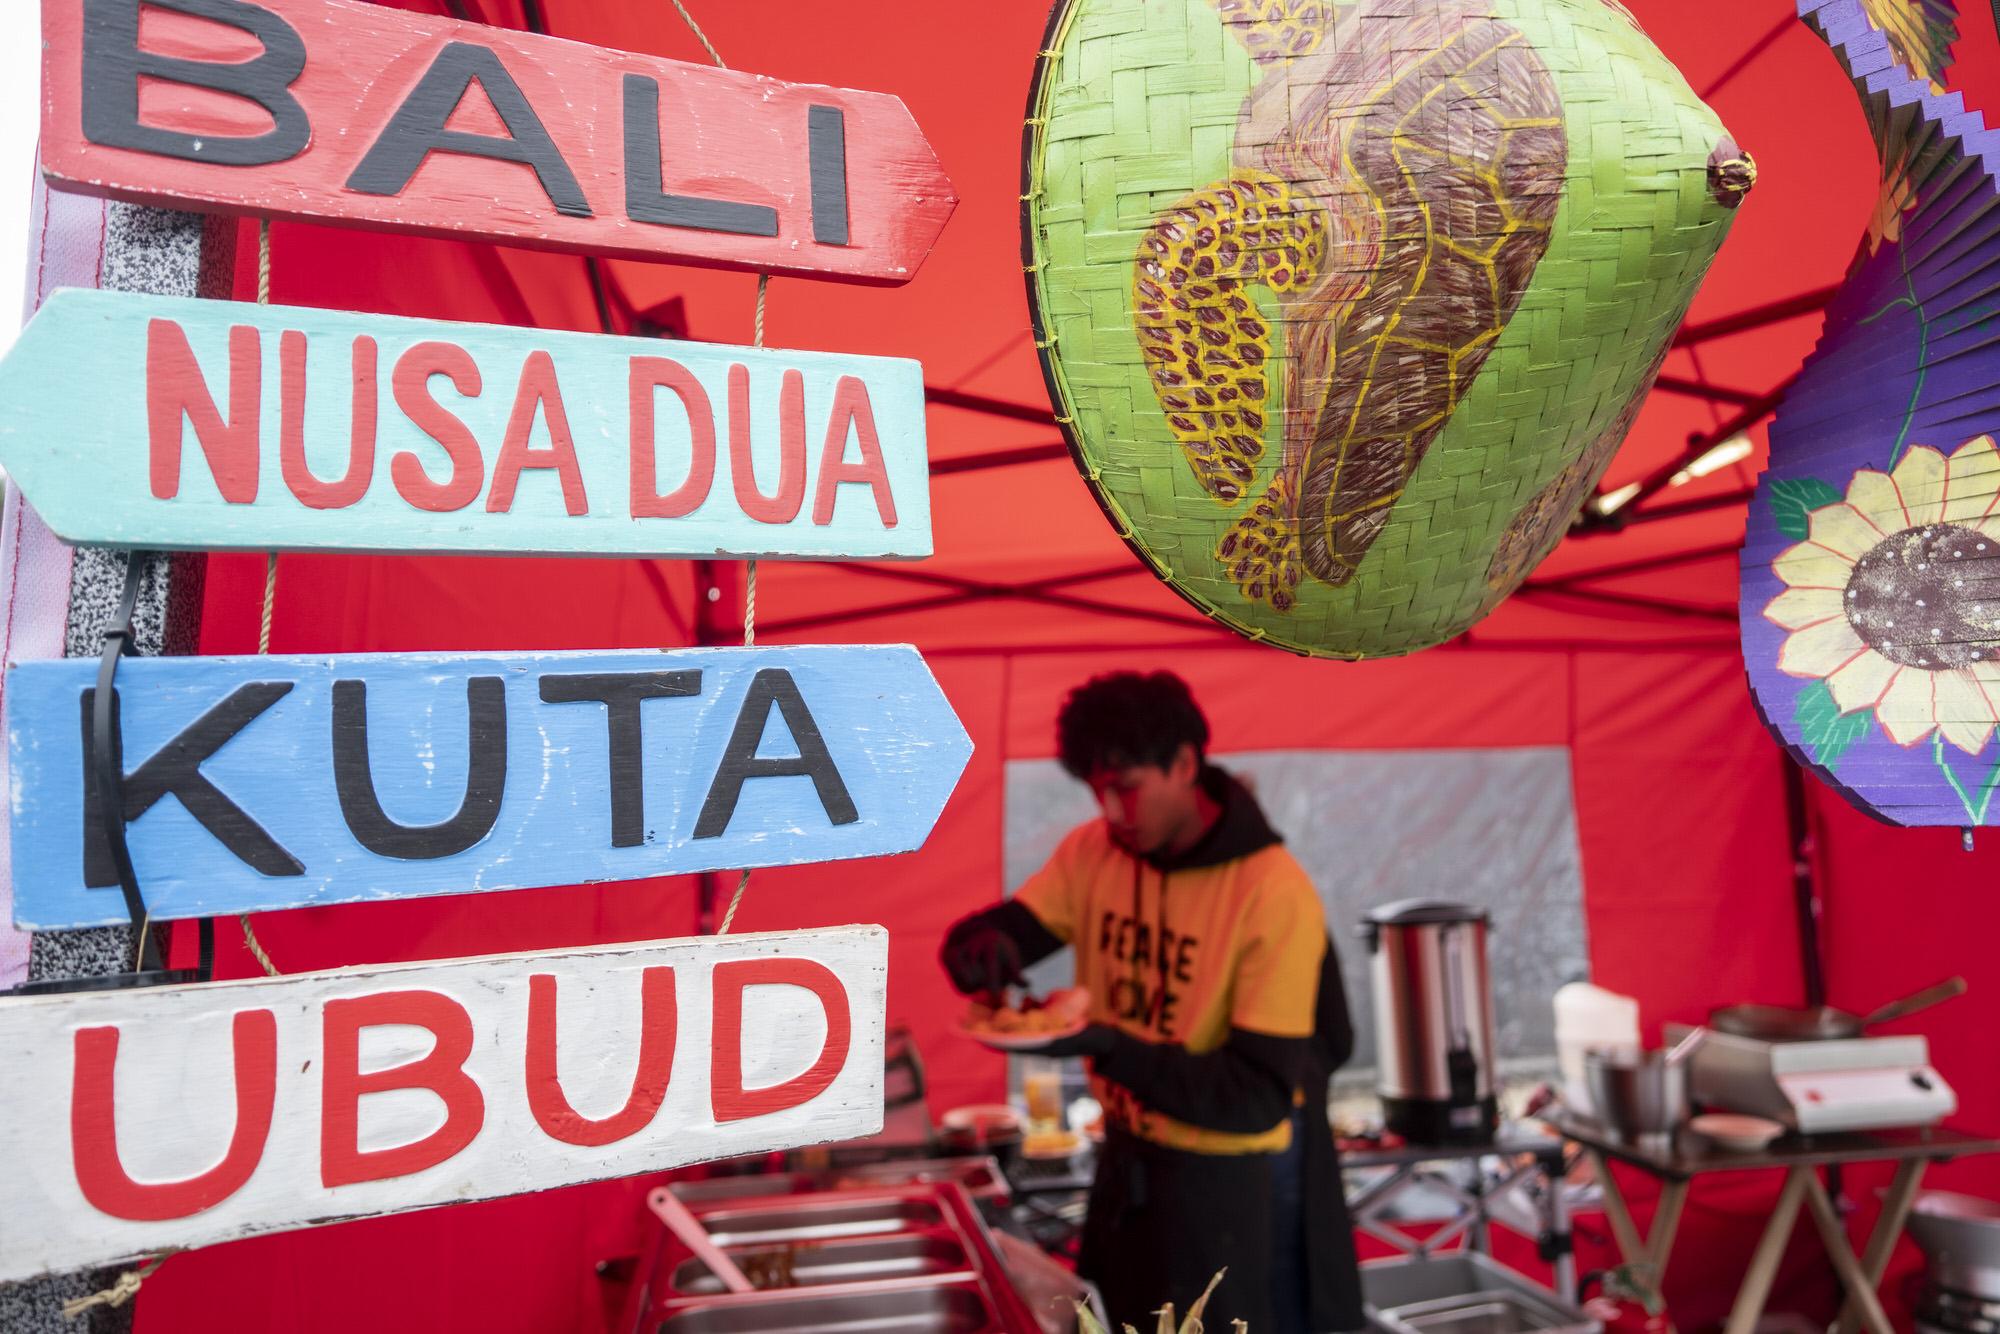 SPIJS-foodfestival-5juni21-00009.jpg